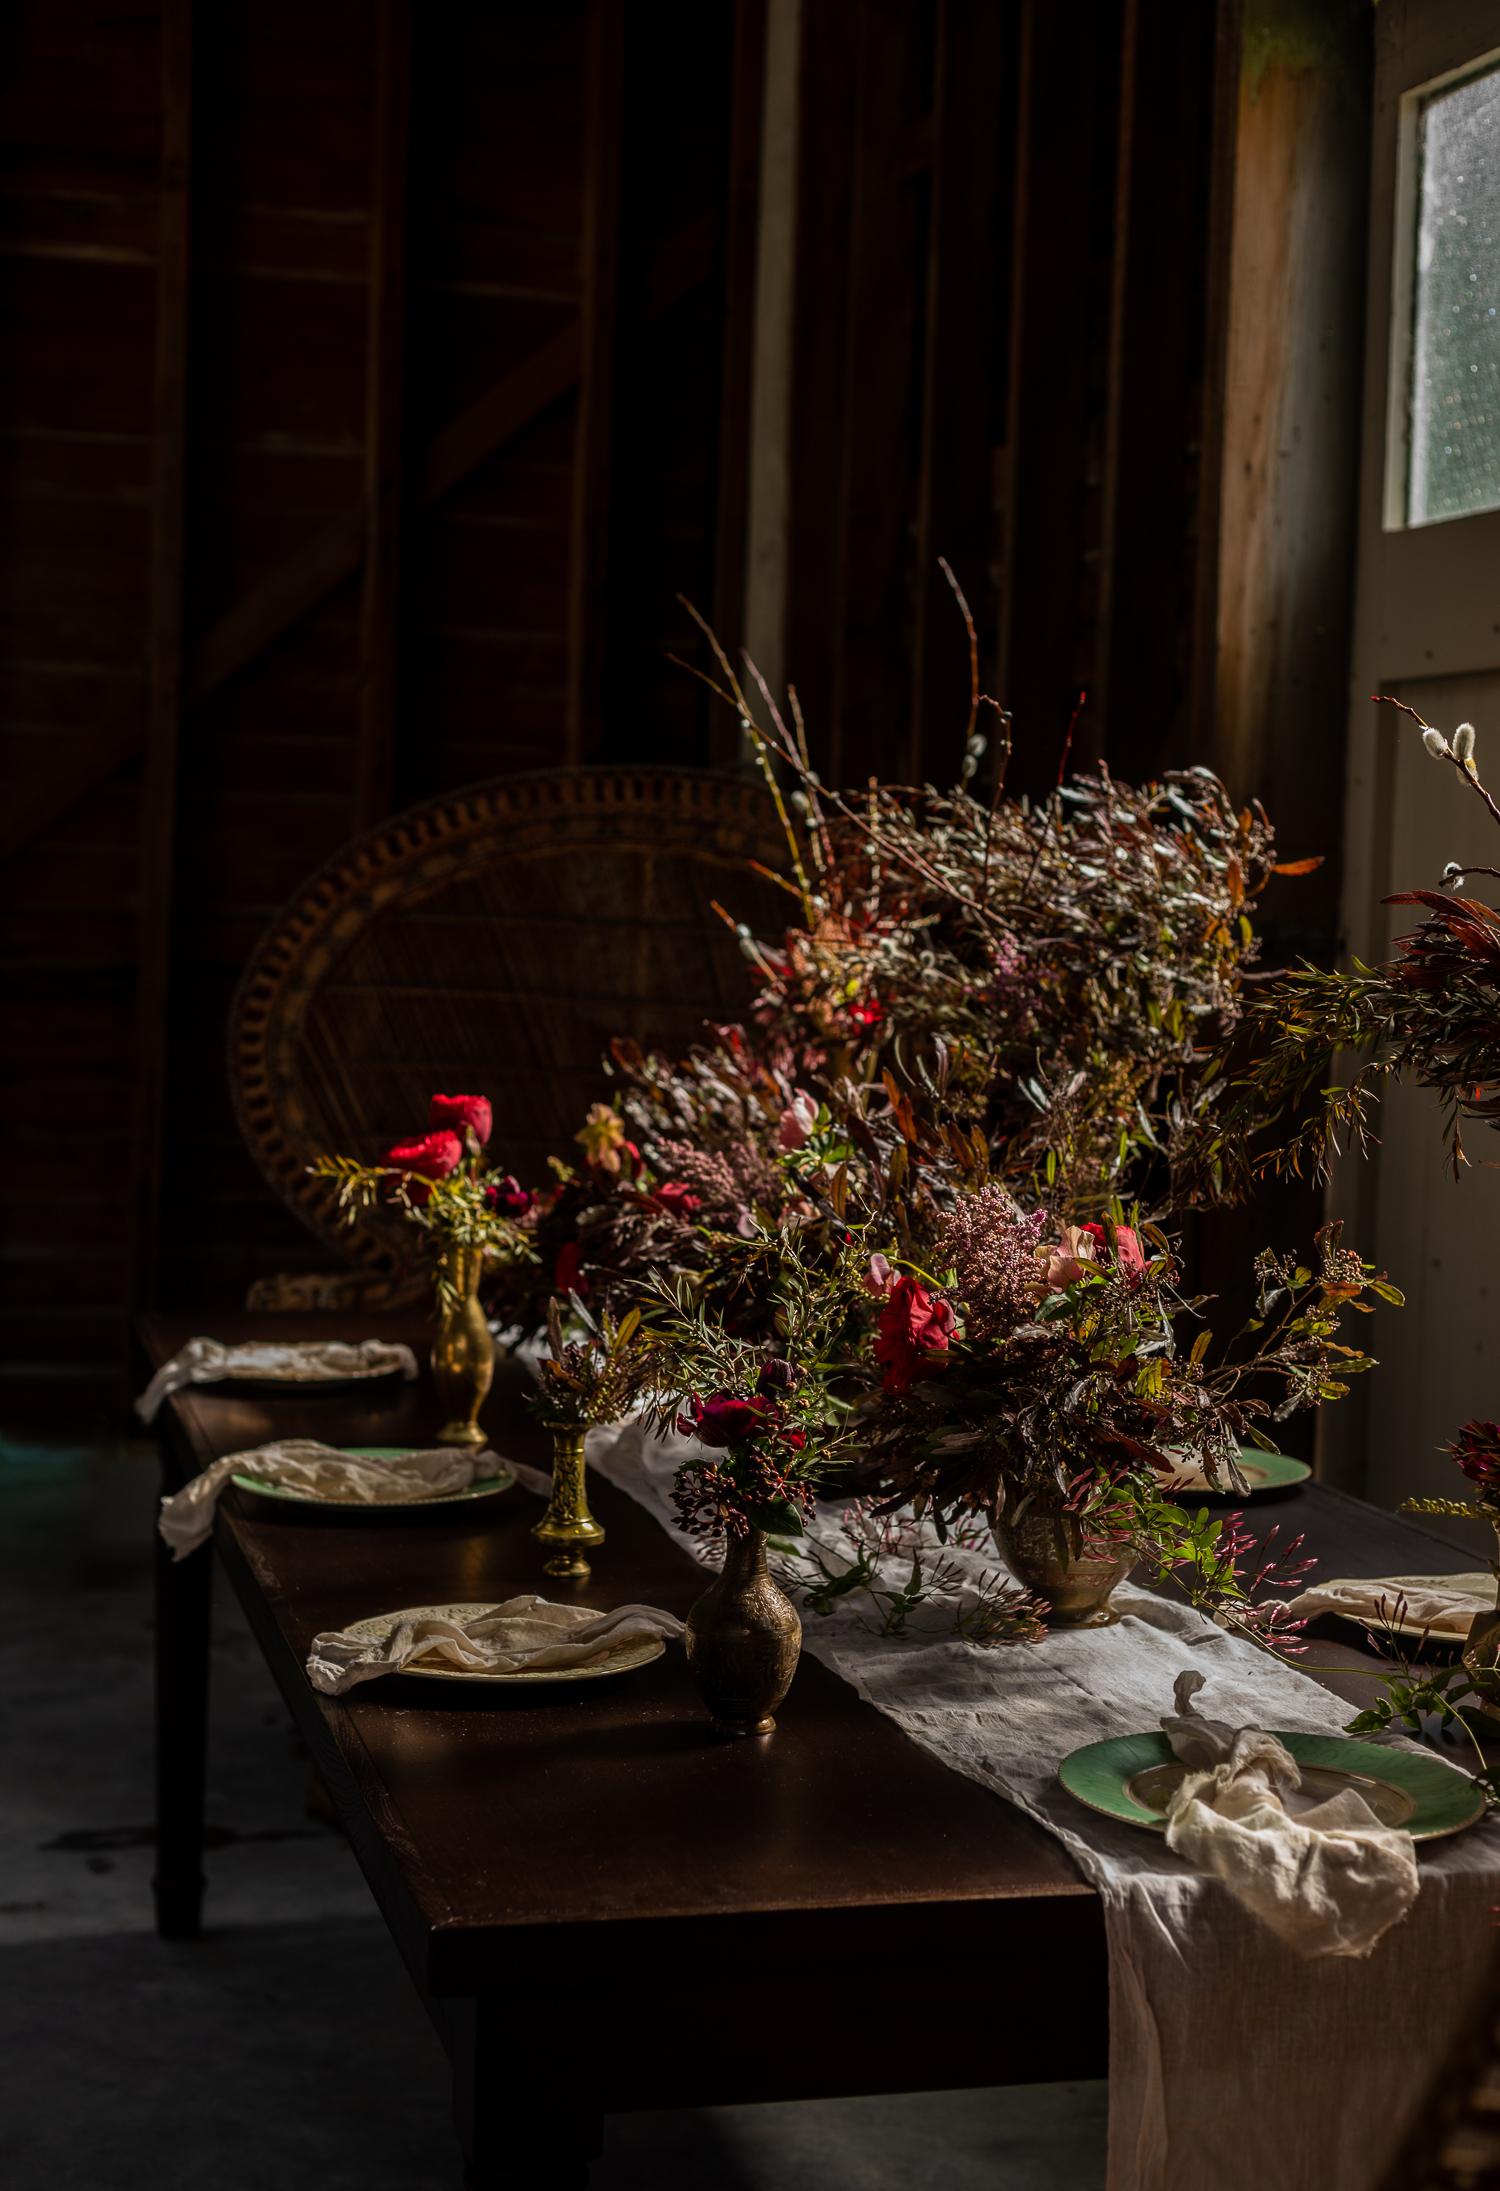 hawkes-bay-wedding-photographer-at-black-barn-winery-2.jpg